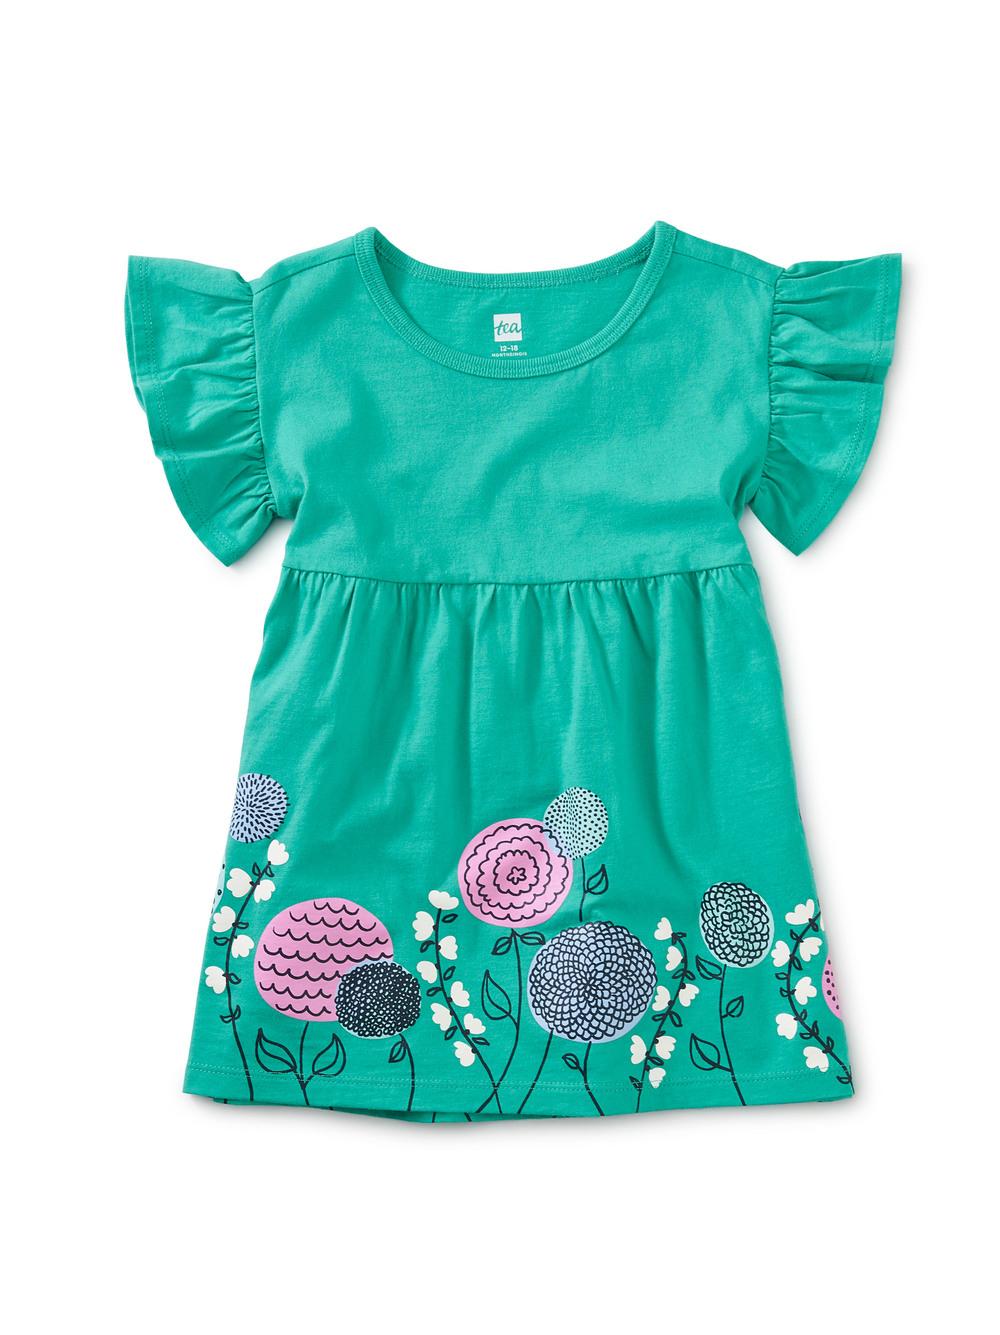 Lora Graphic Baby Dress